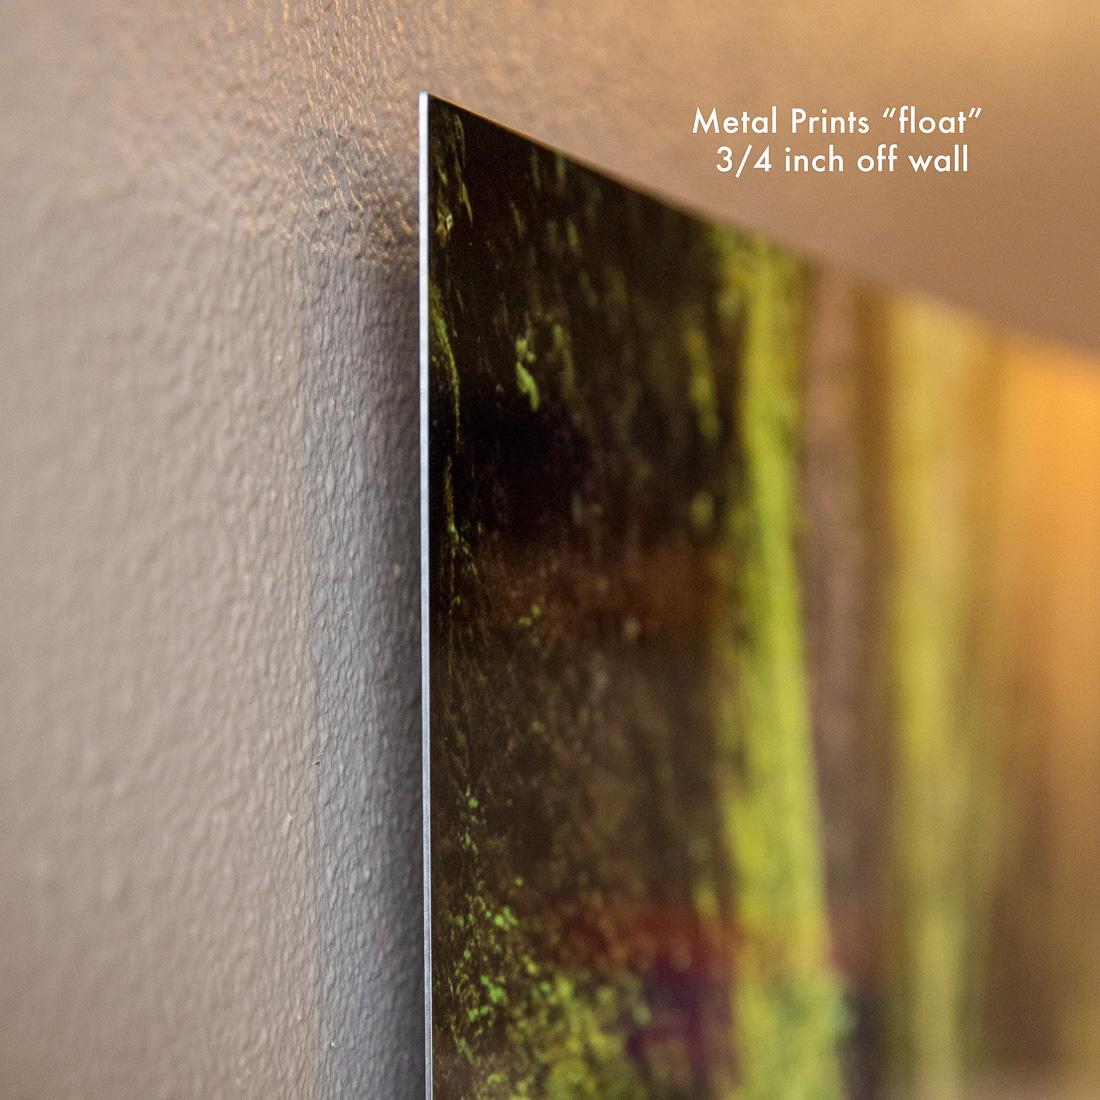 blaine-bethany-prints-04.jpg